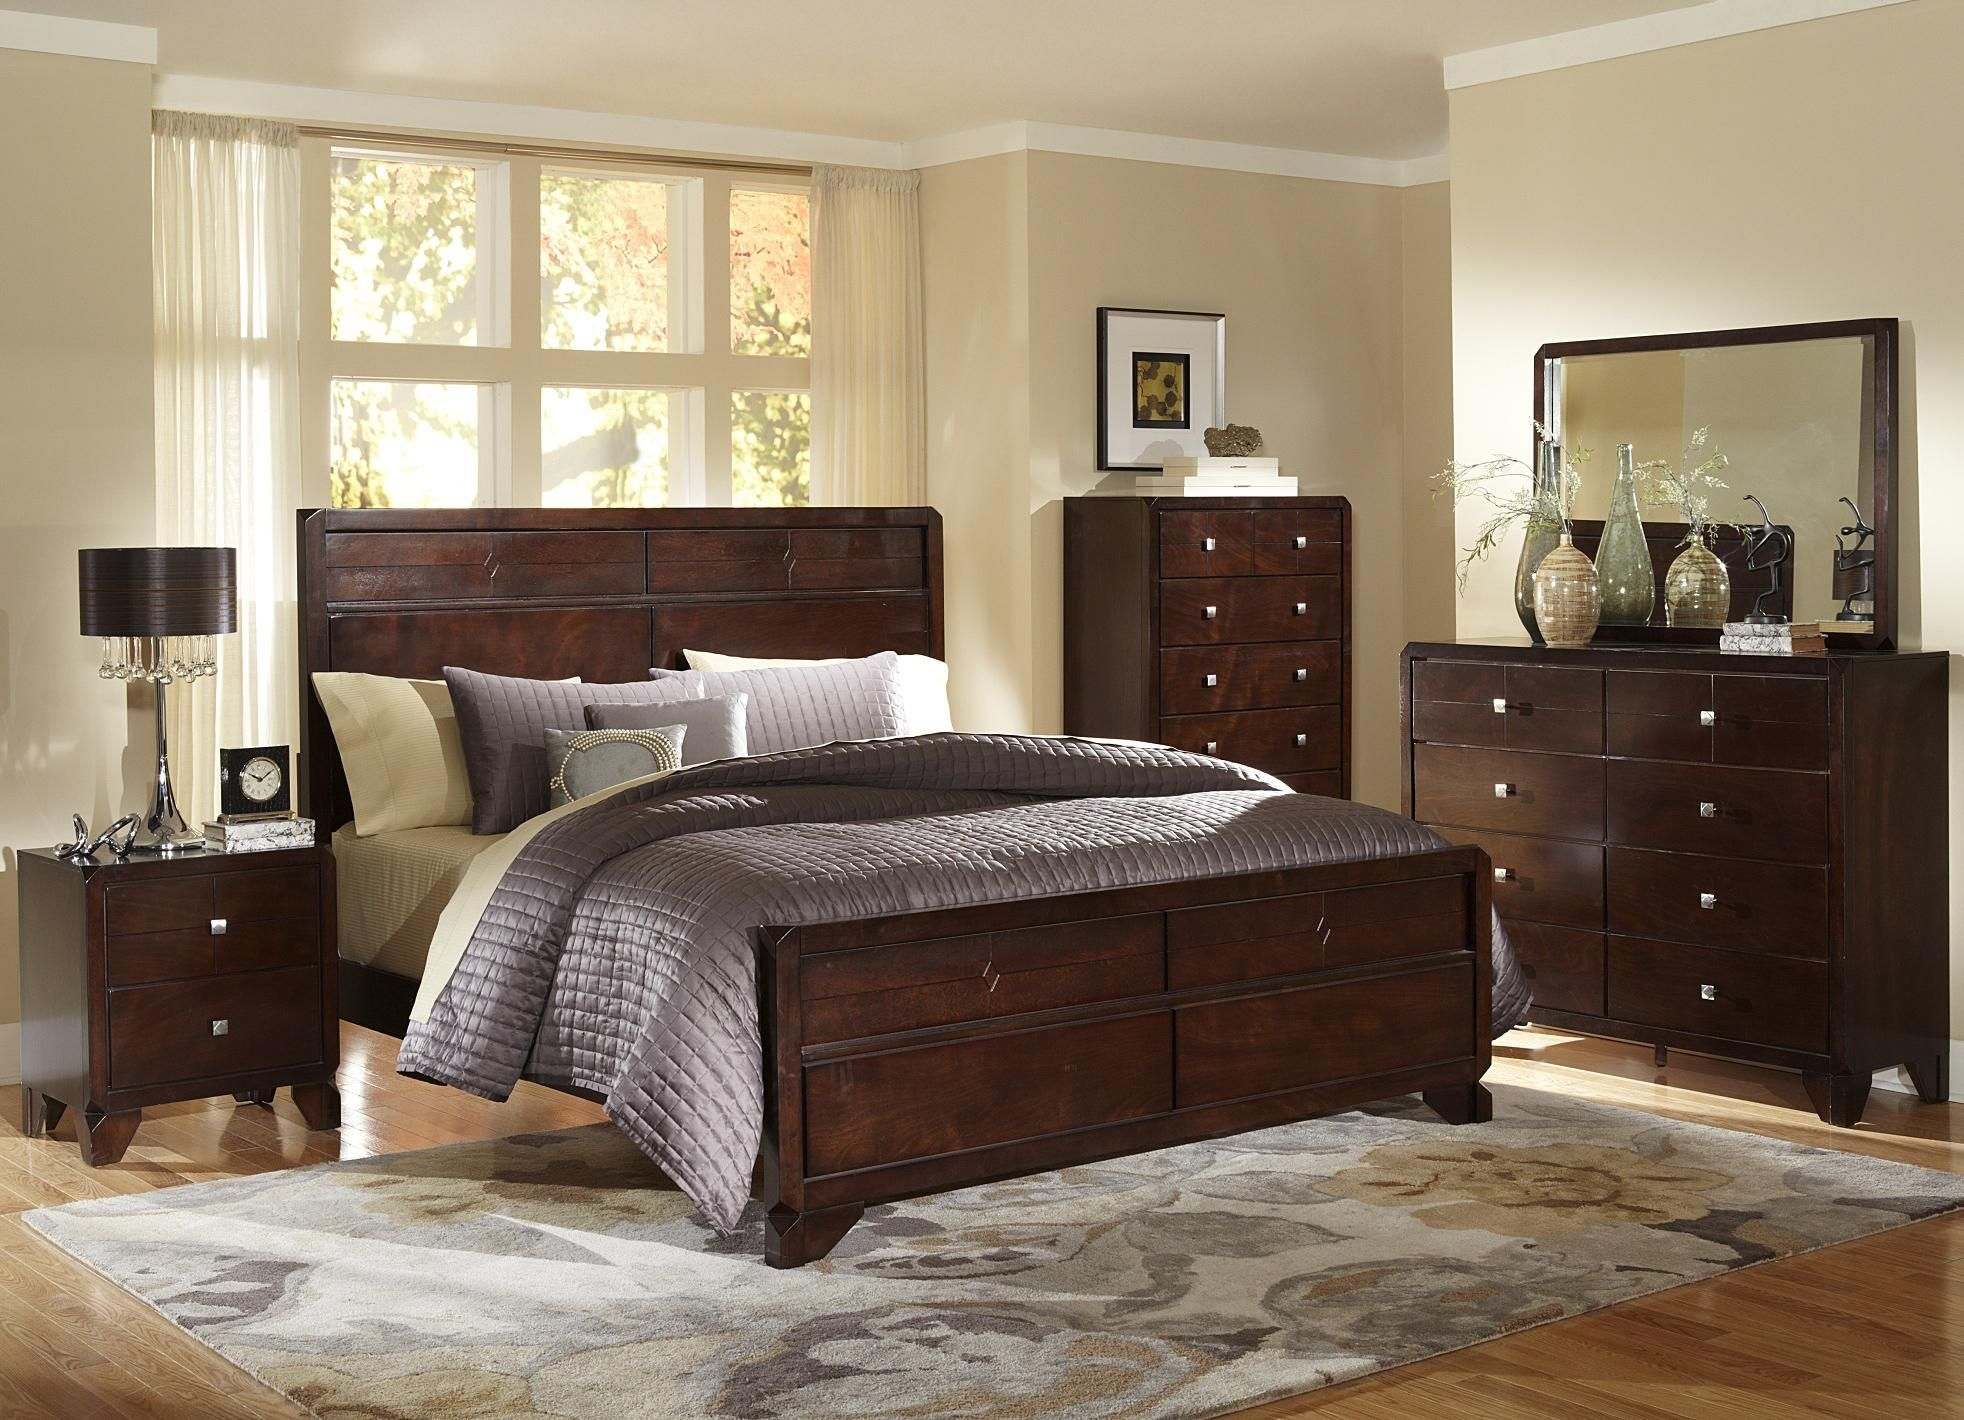 2180a bedroom grouplifestyle   furniture   pinterest   bedroom